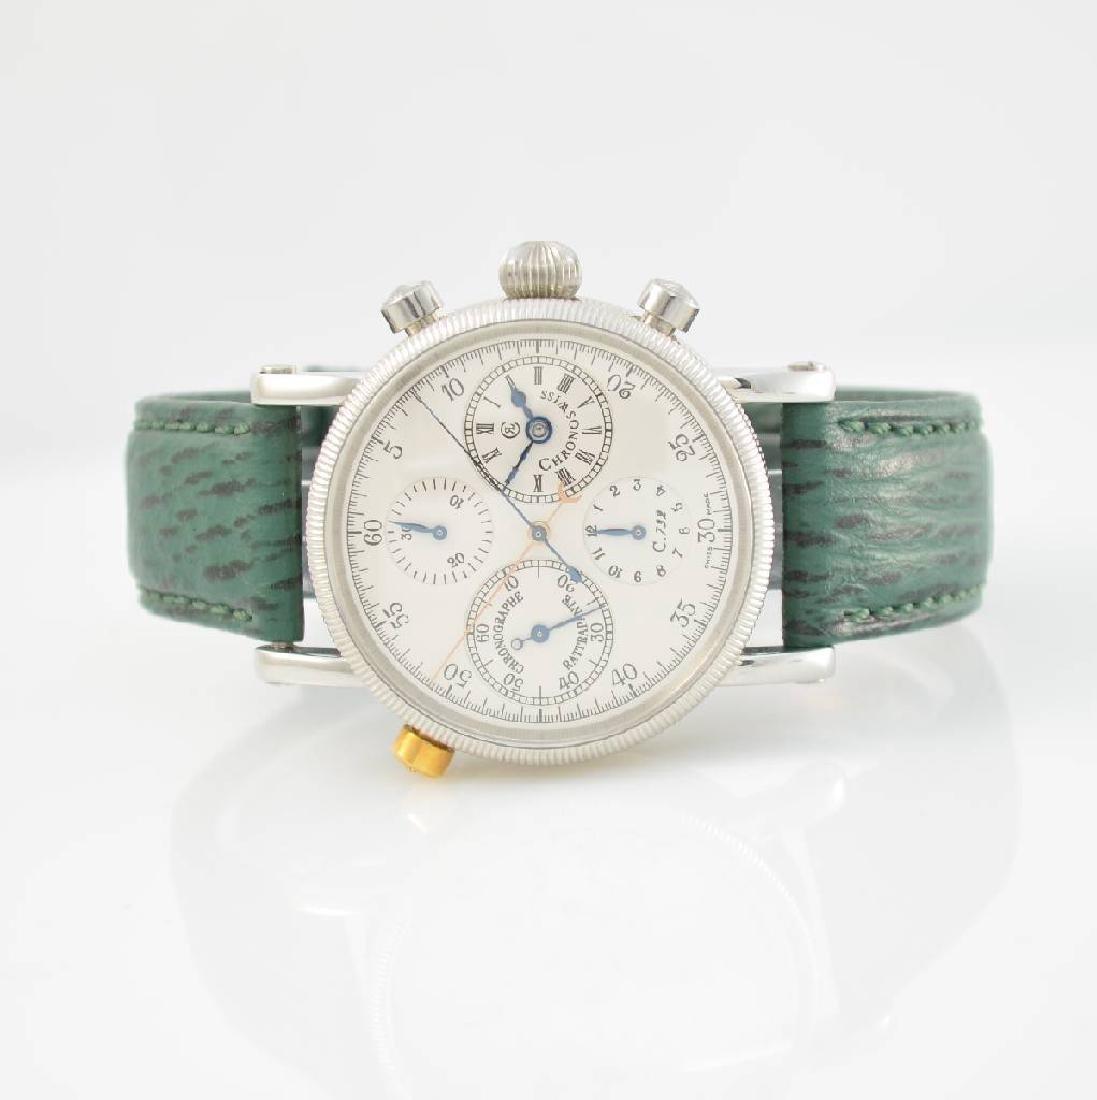 CHRONOSWISS chronograph Rattrapante gents wristwatch